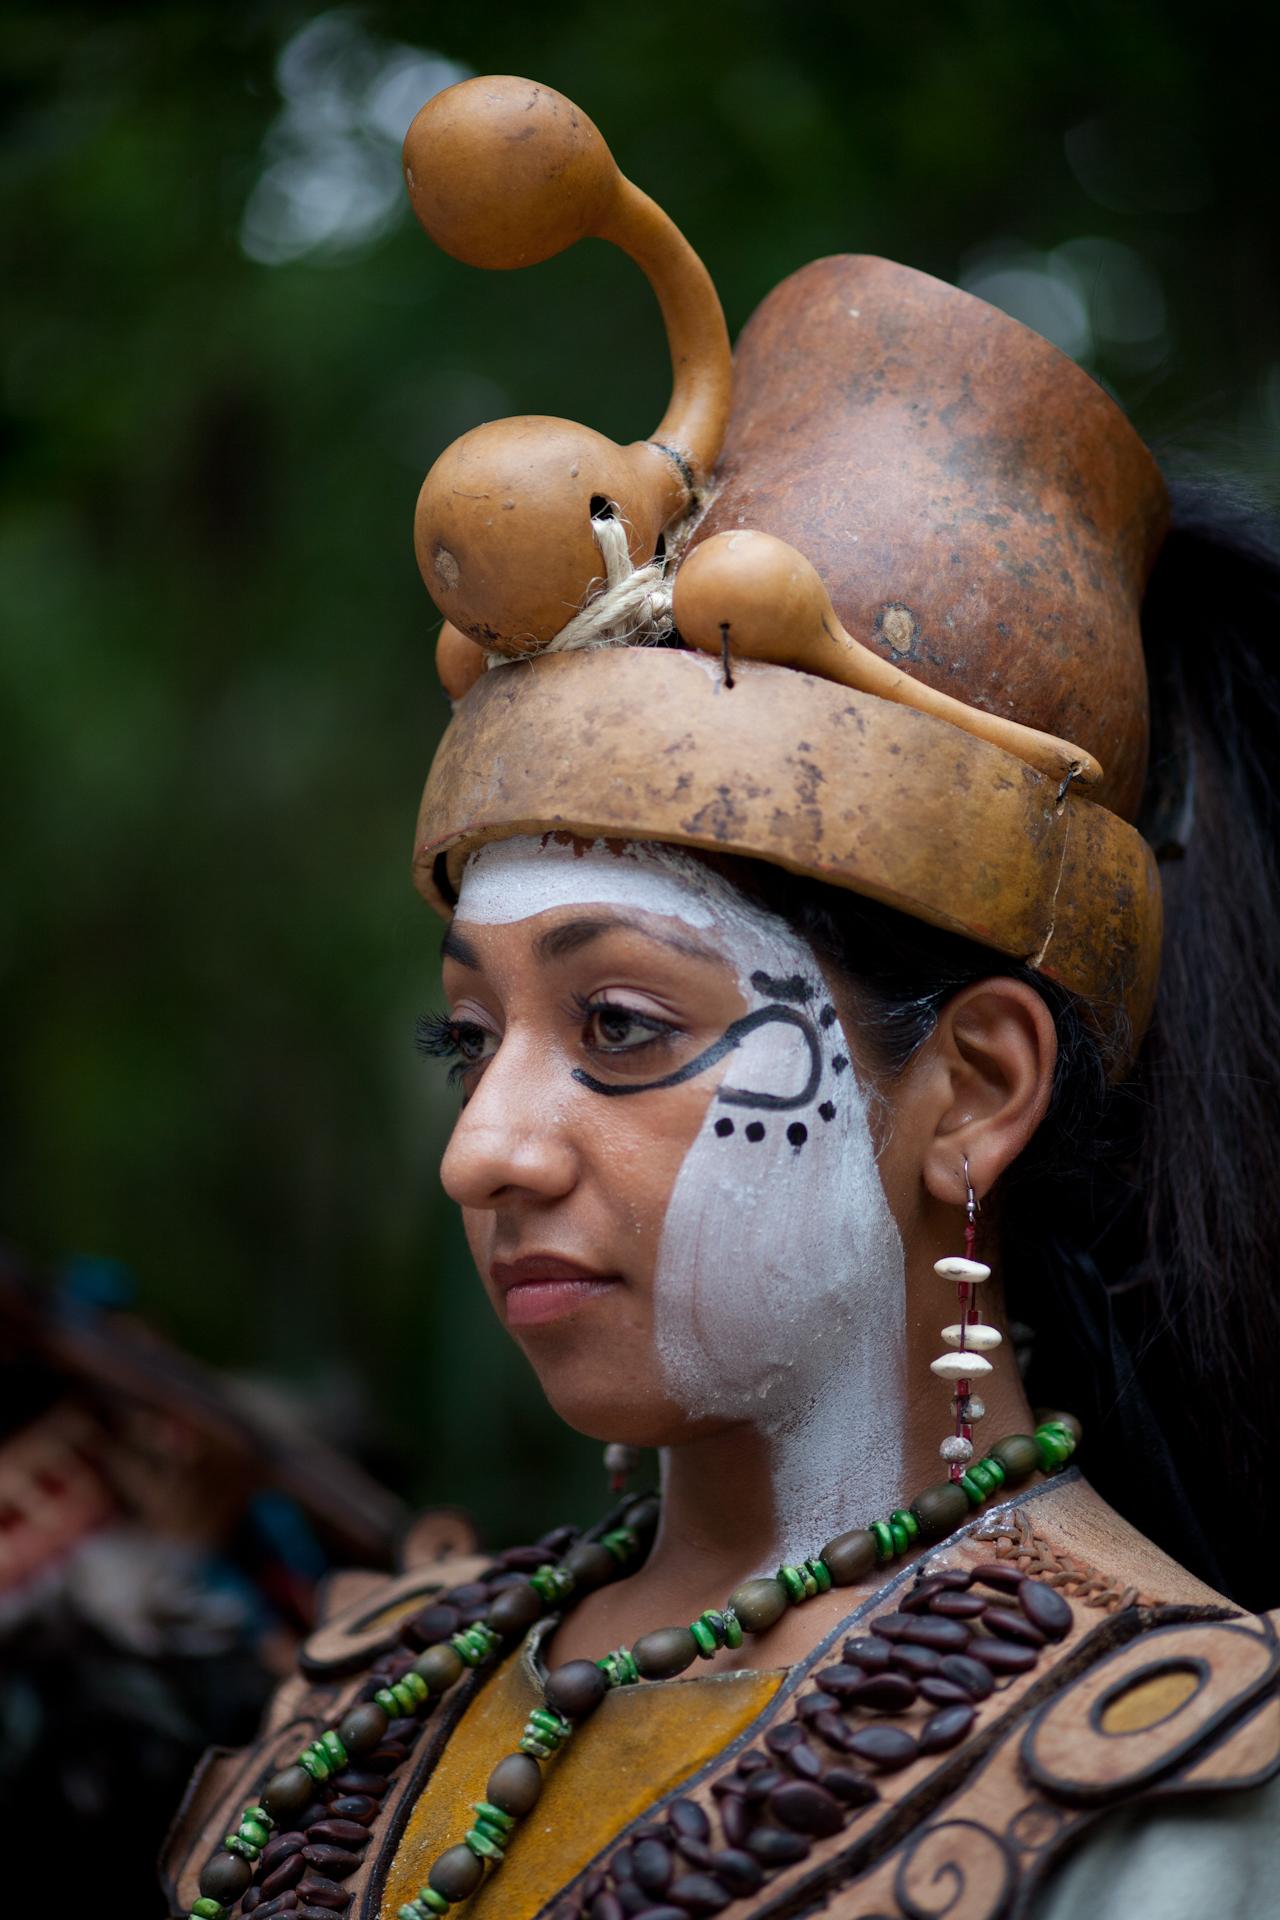 картинка идеал красоты племени майя широкая